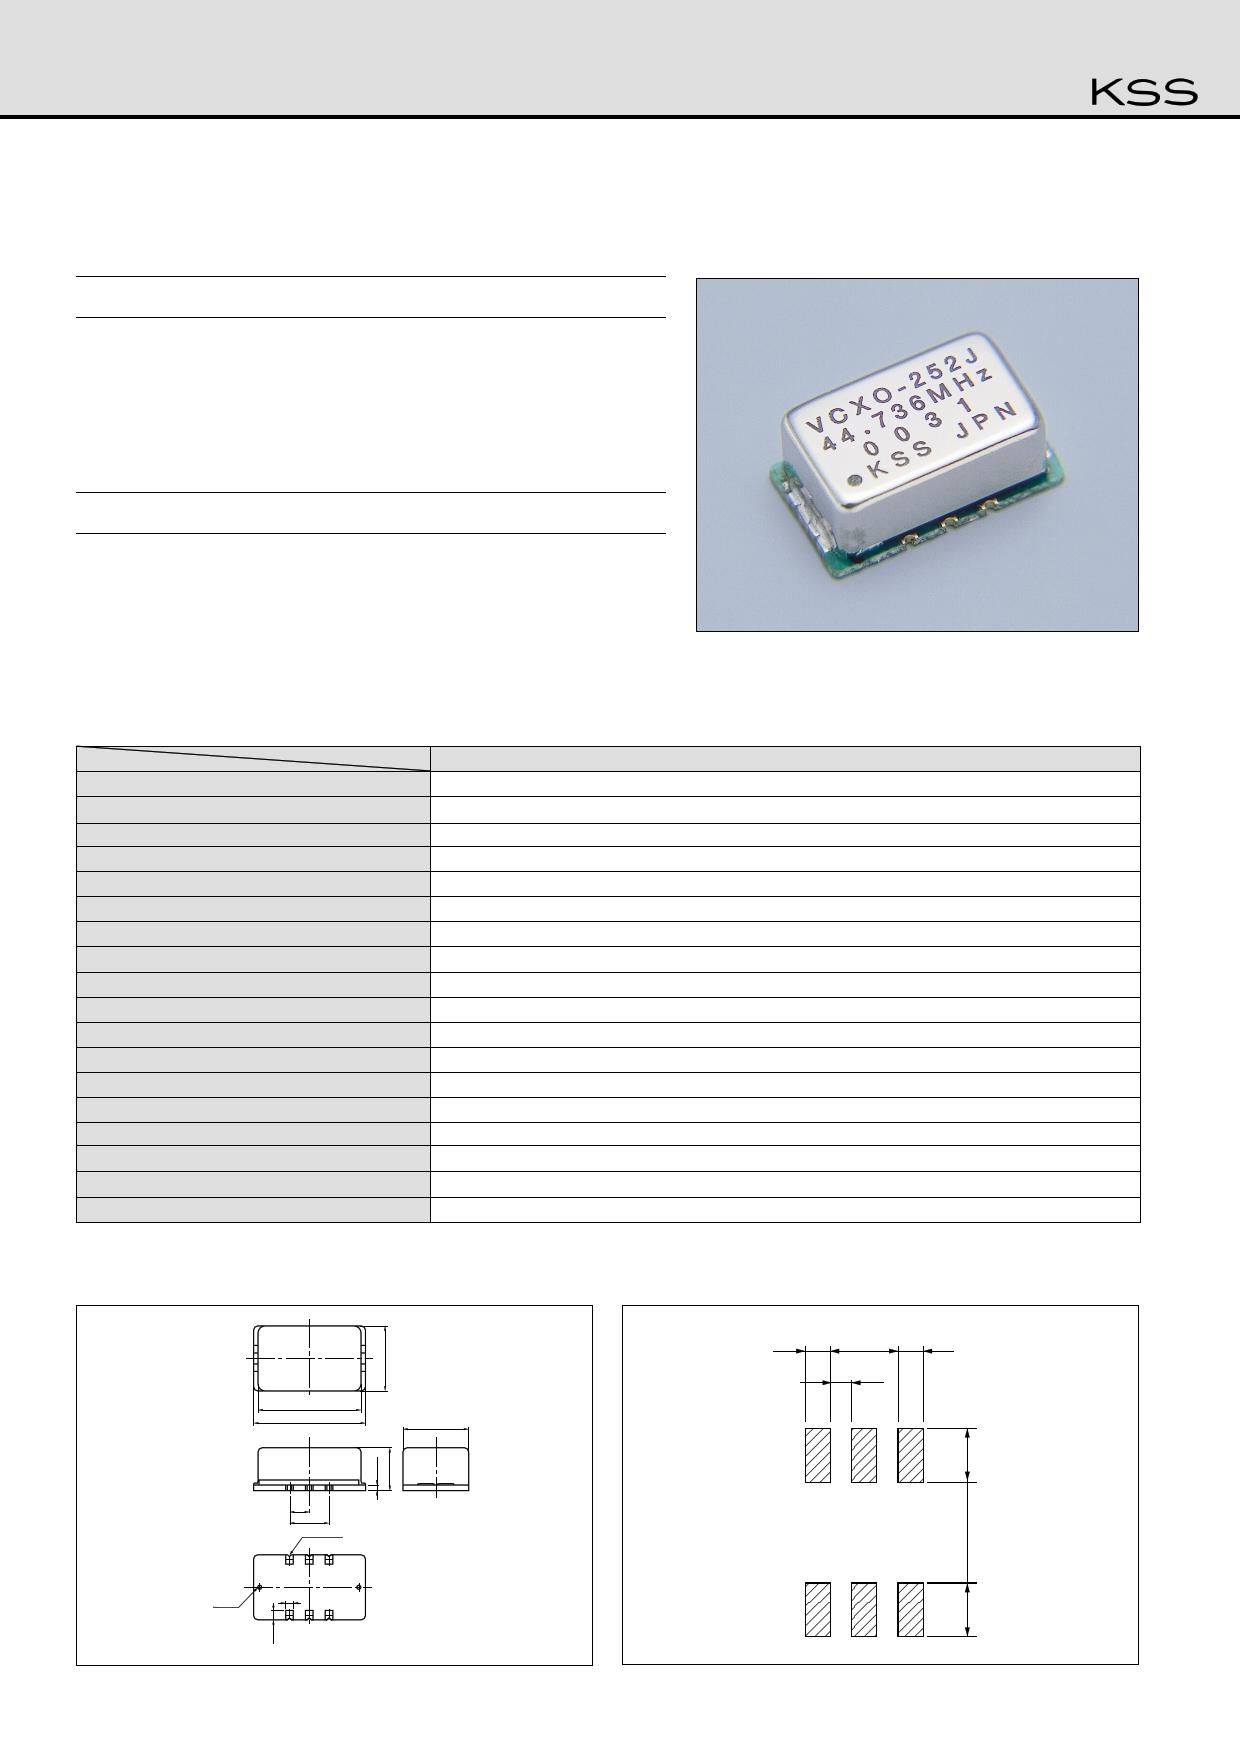 VCXO-252J datasheet